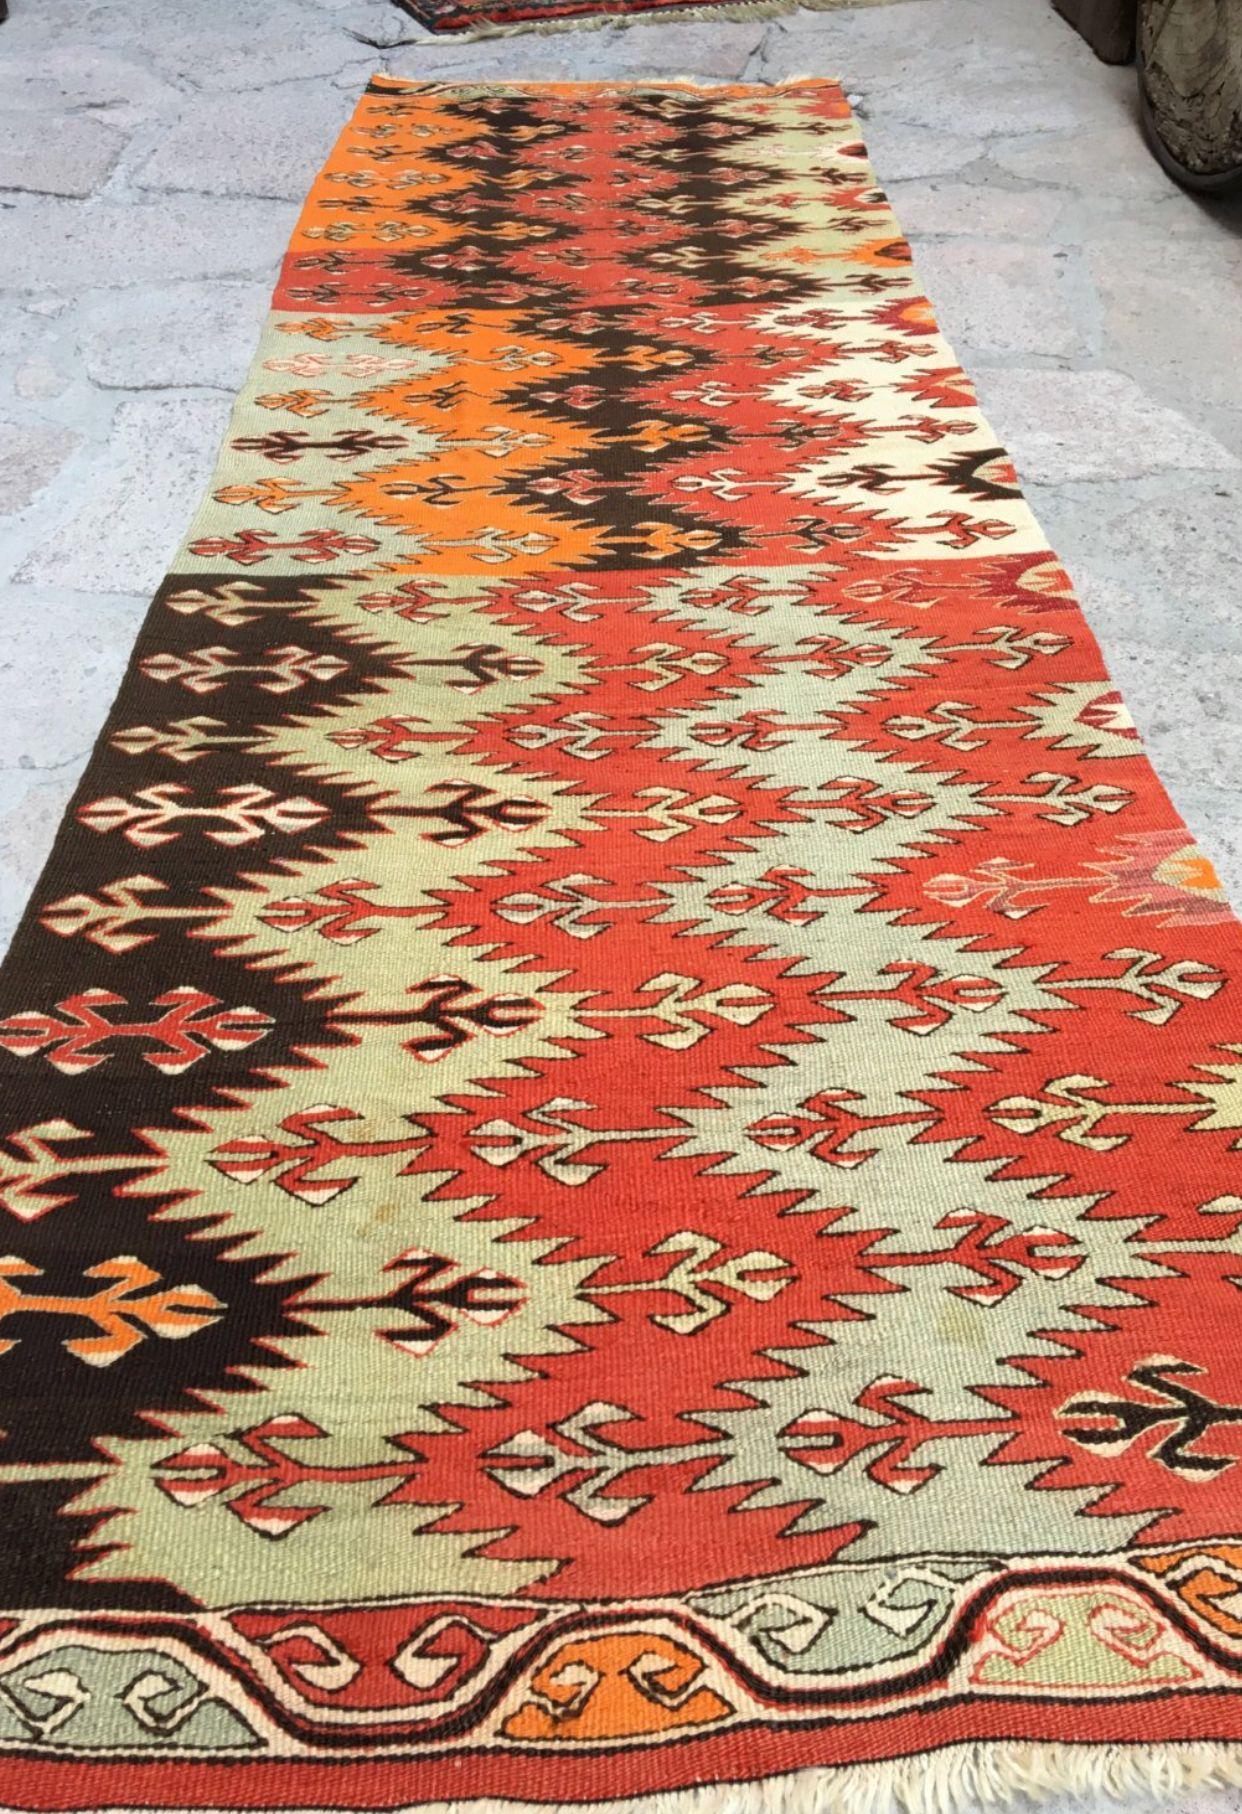 rugs turkishrug homedecor antique vintage runner